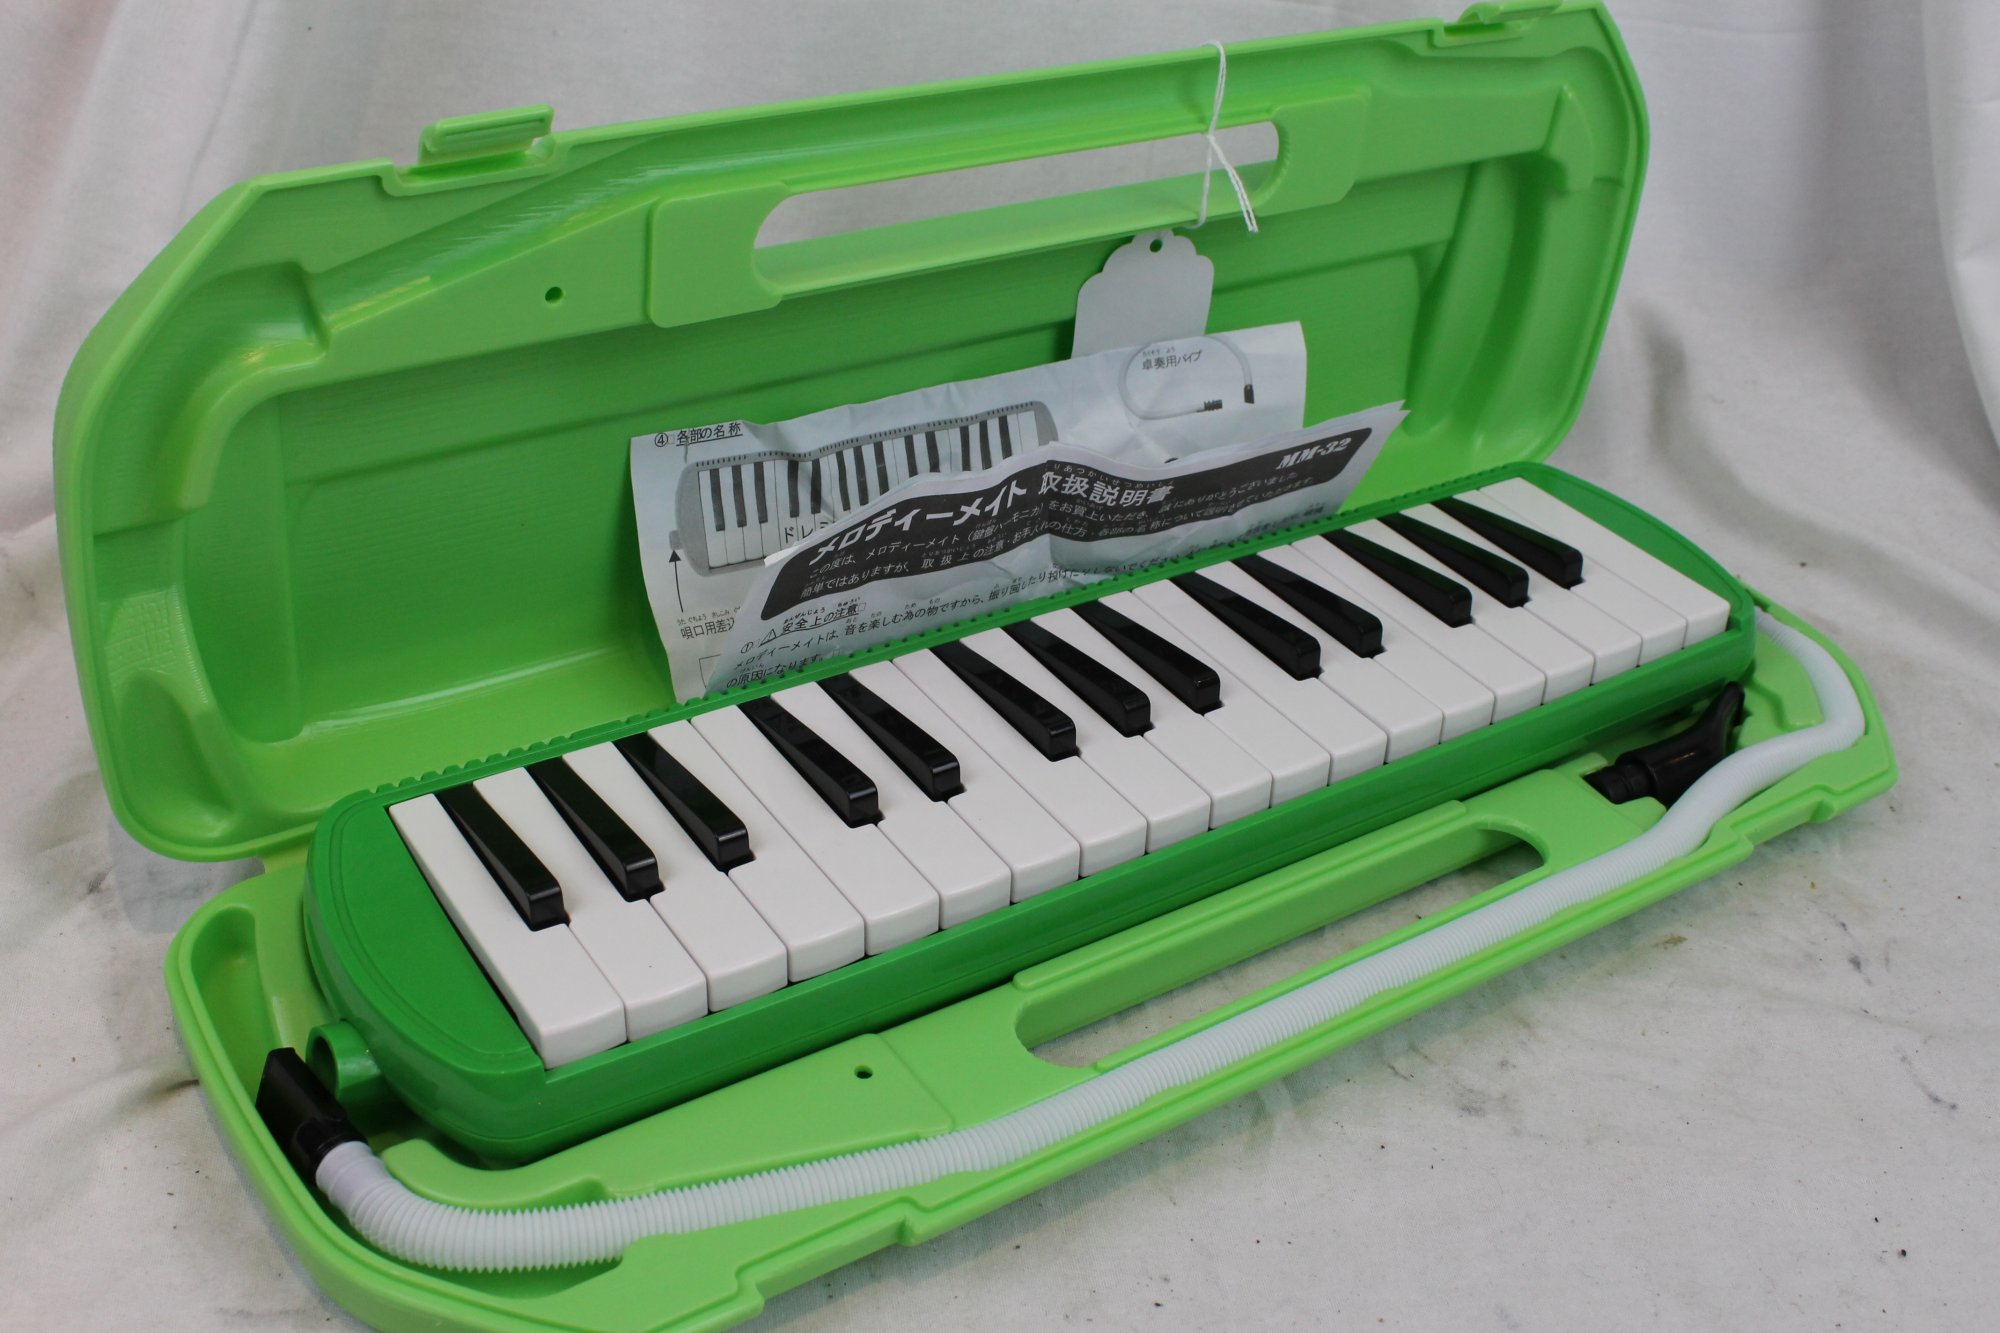 3112 - Green Suzuki MM32 Melodica